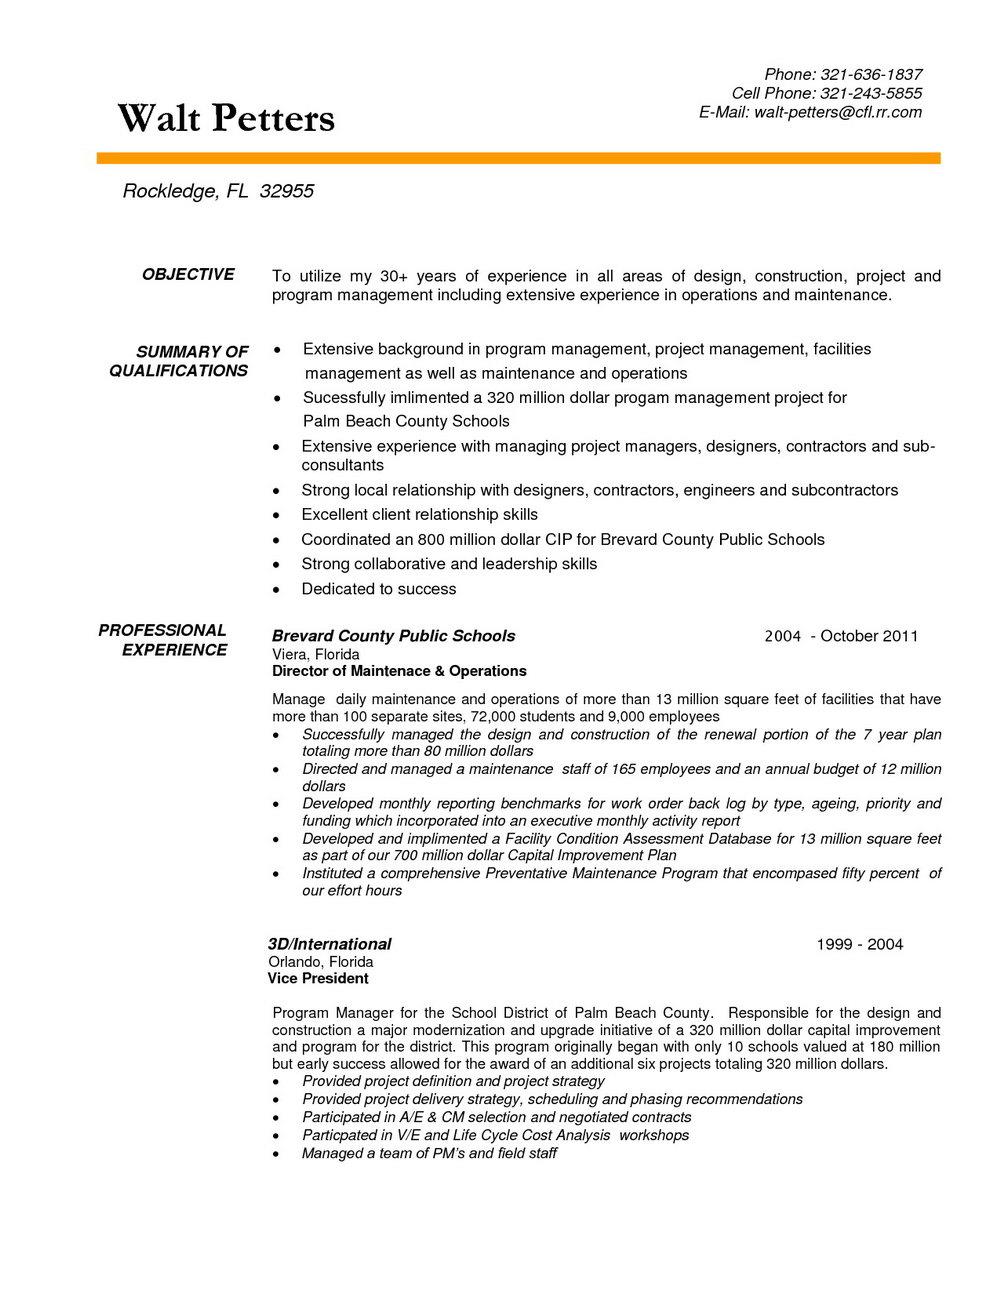 Best Resume Builder Sites